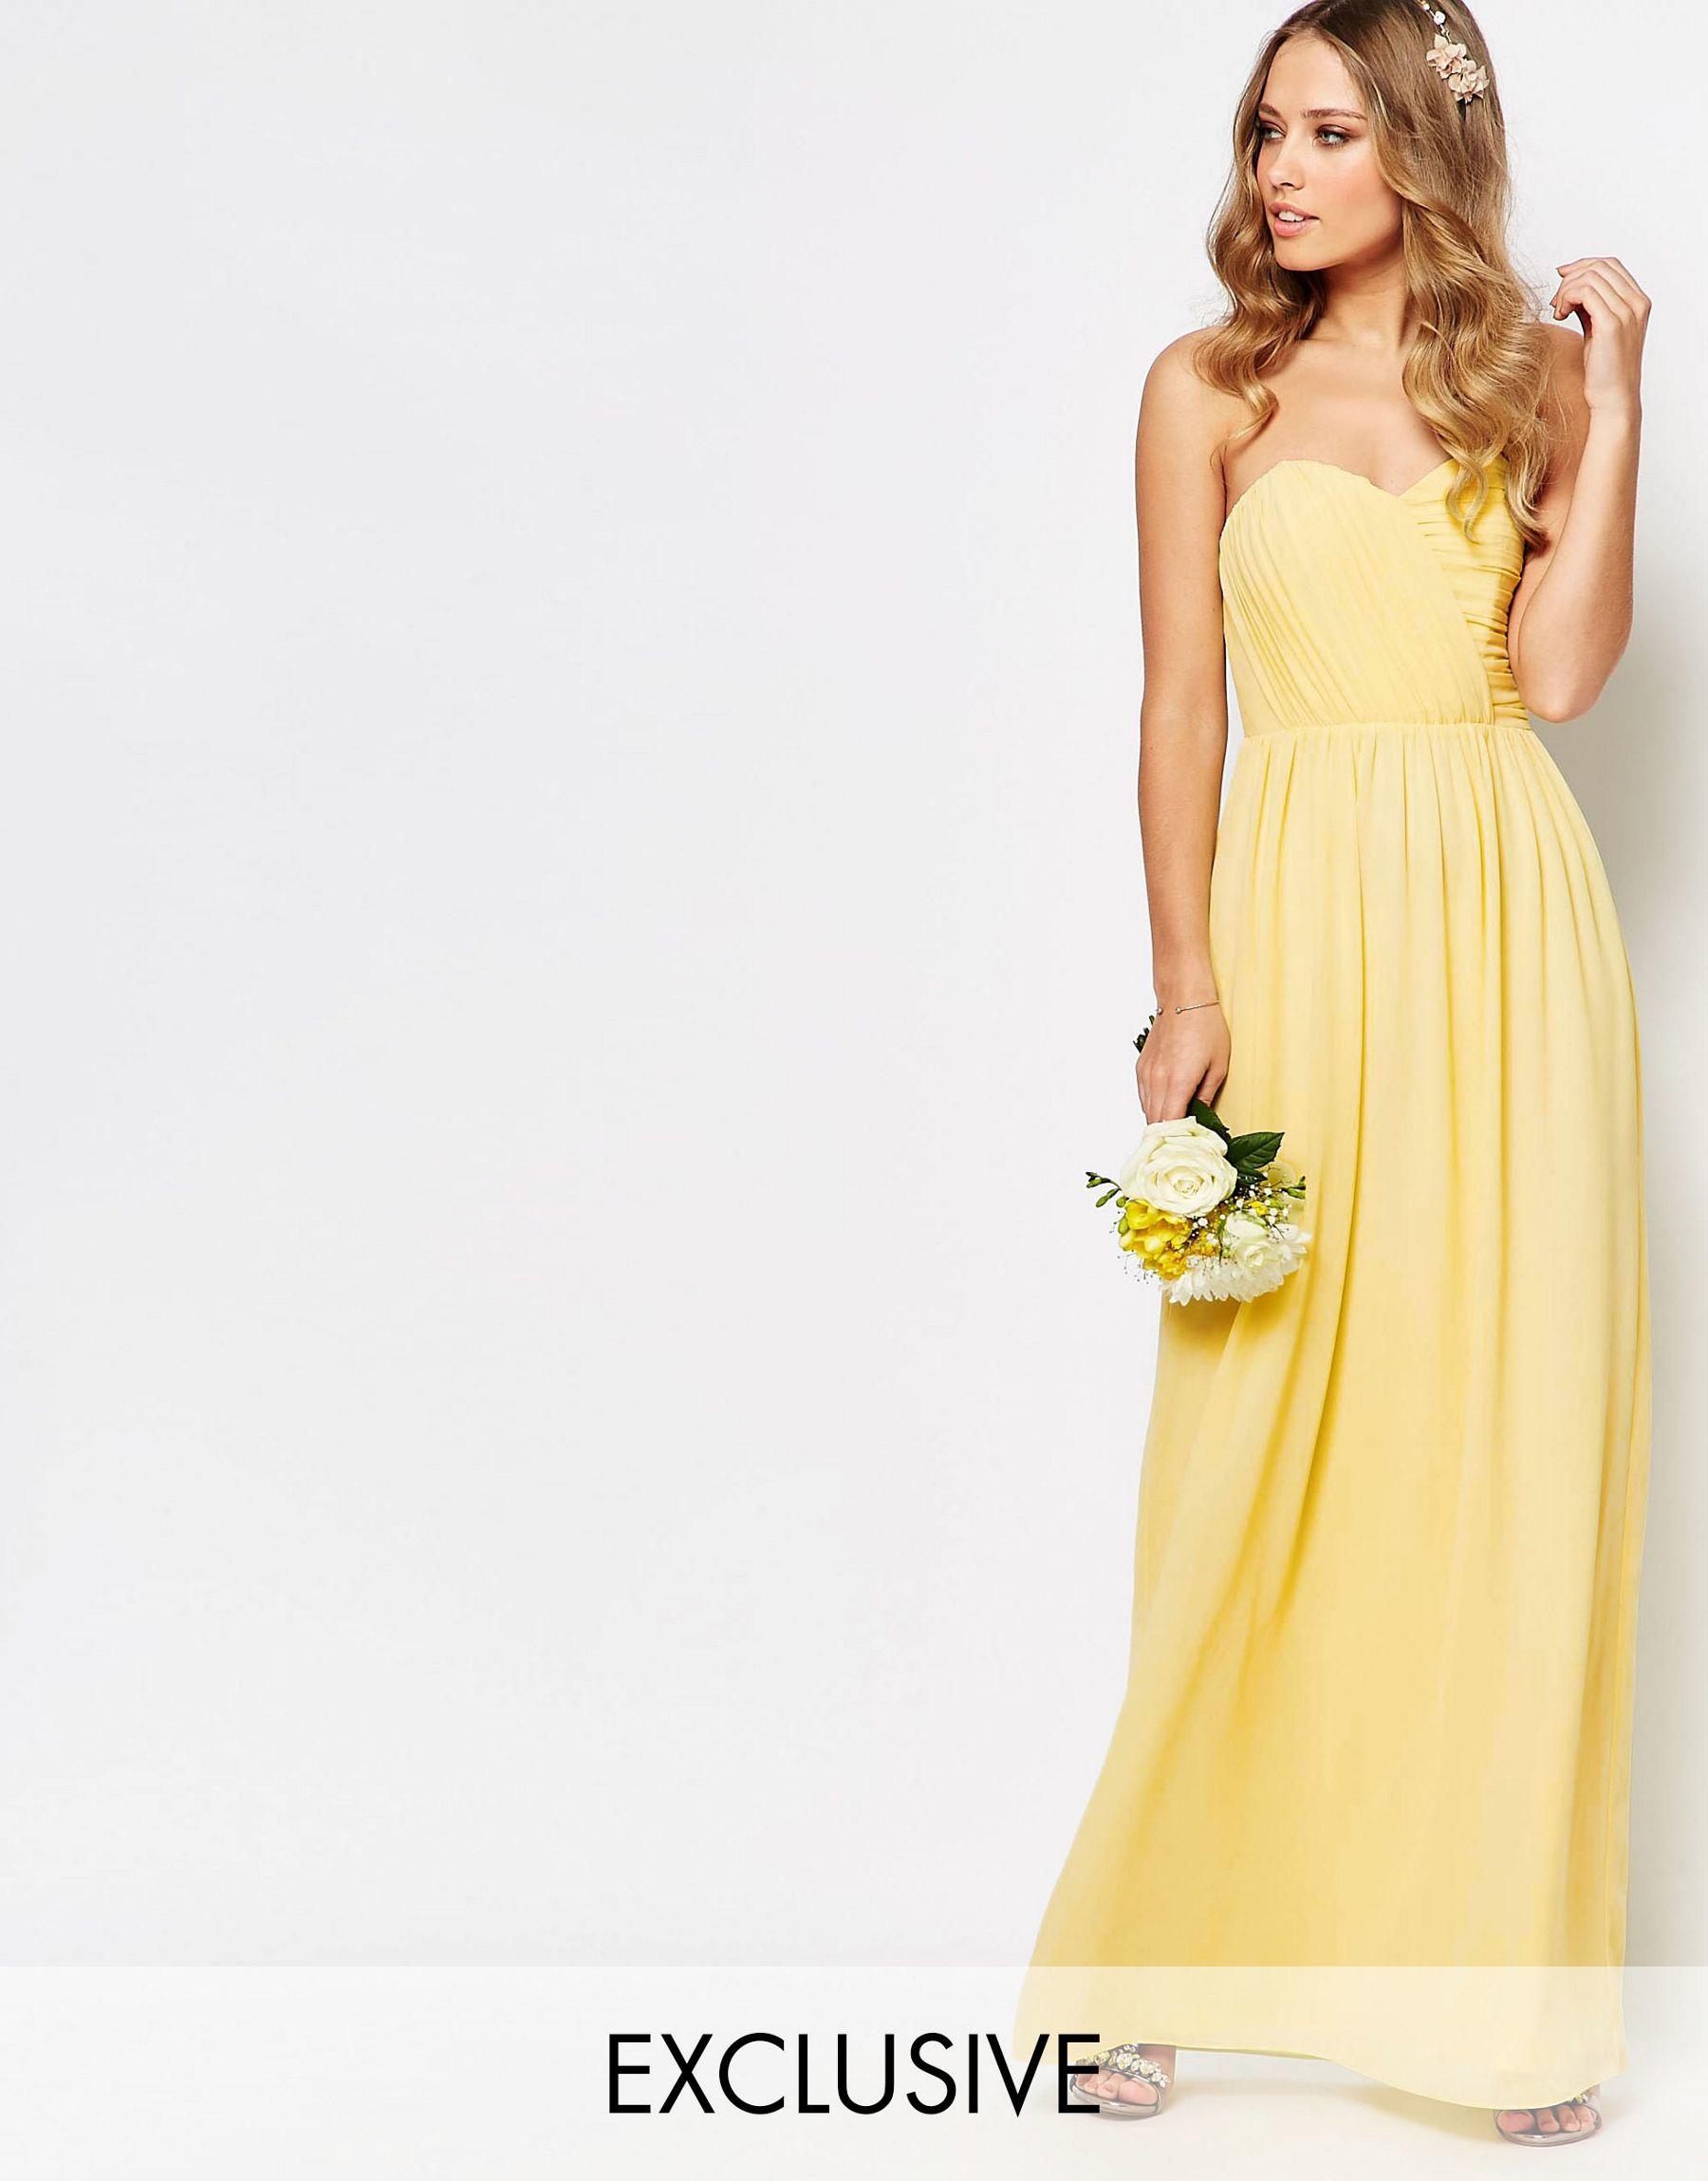 Tfnc london wedding bandeau chiffon maxi dress in yellow for Yellow maxi dress for wedding